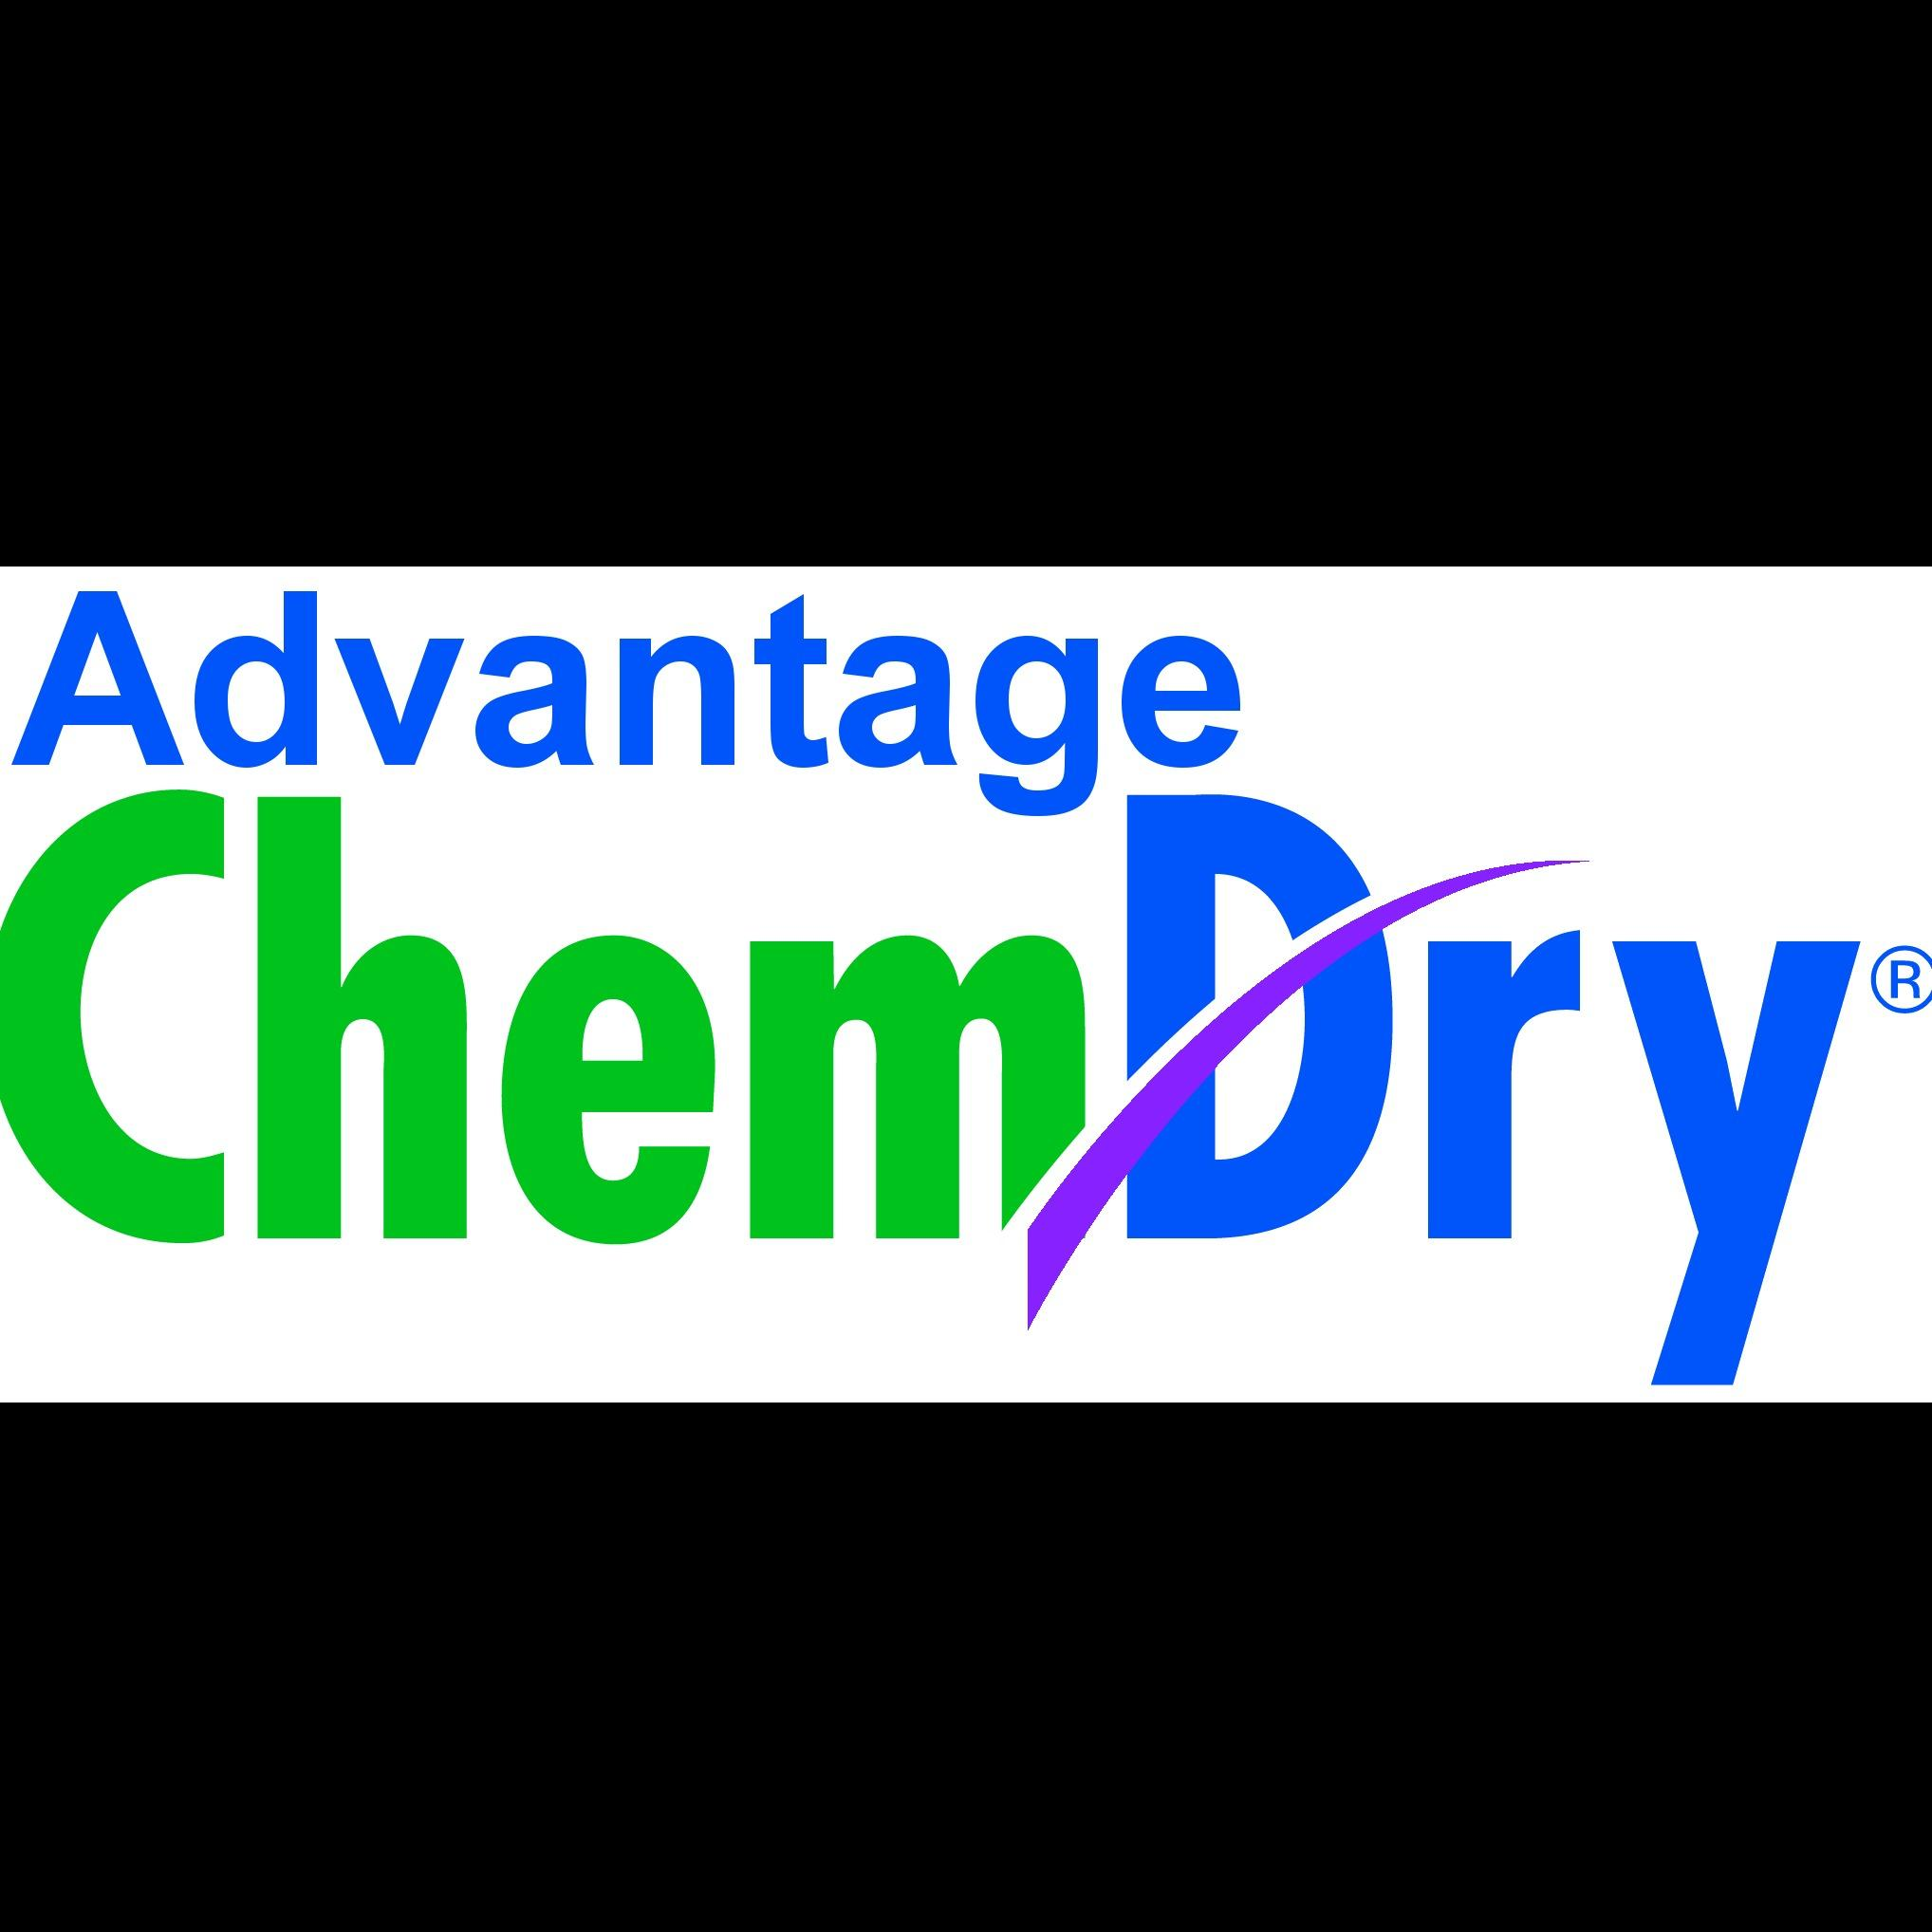 Advantage Chem-Dry - Shippensburg, PA 17257 - (717)532-8676 | ShowMeLocal.com